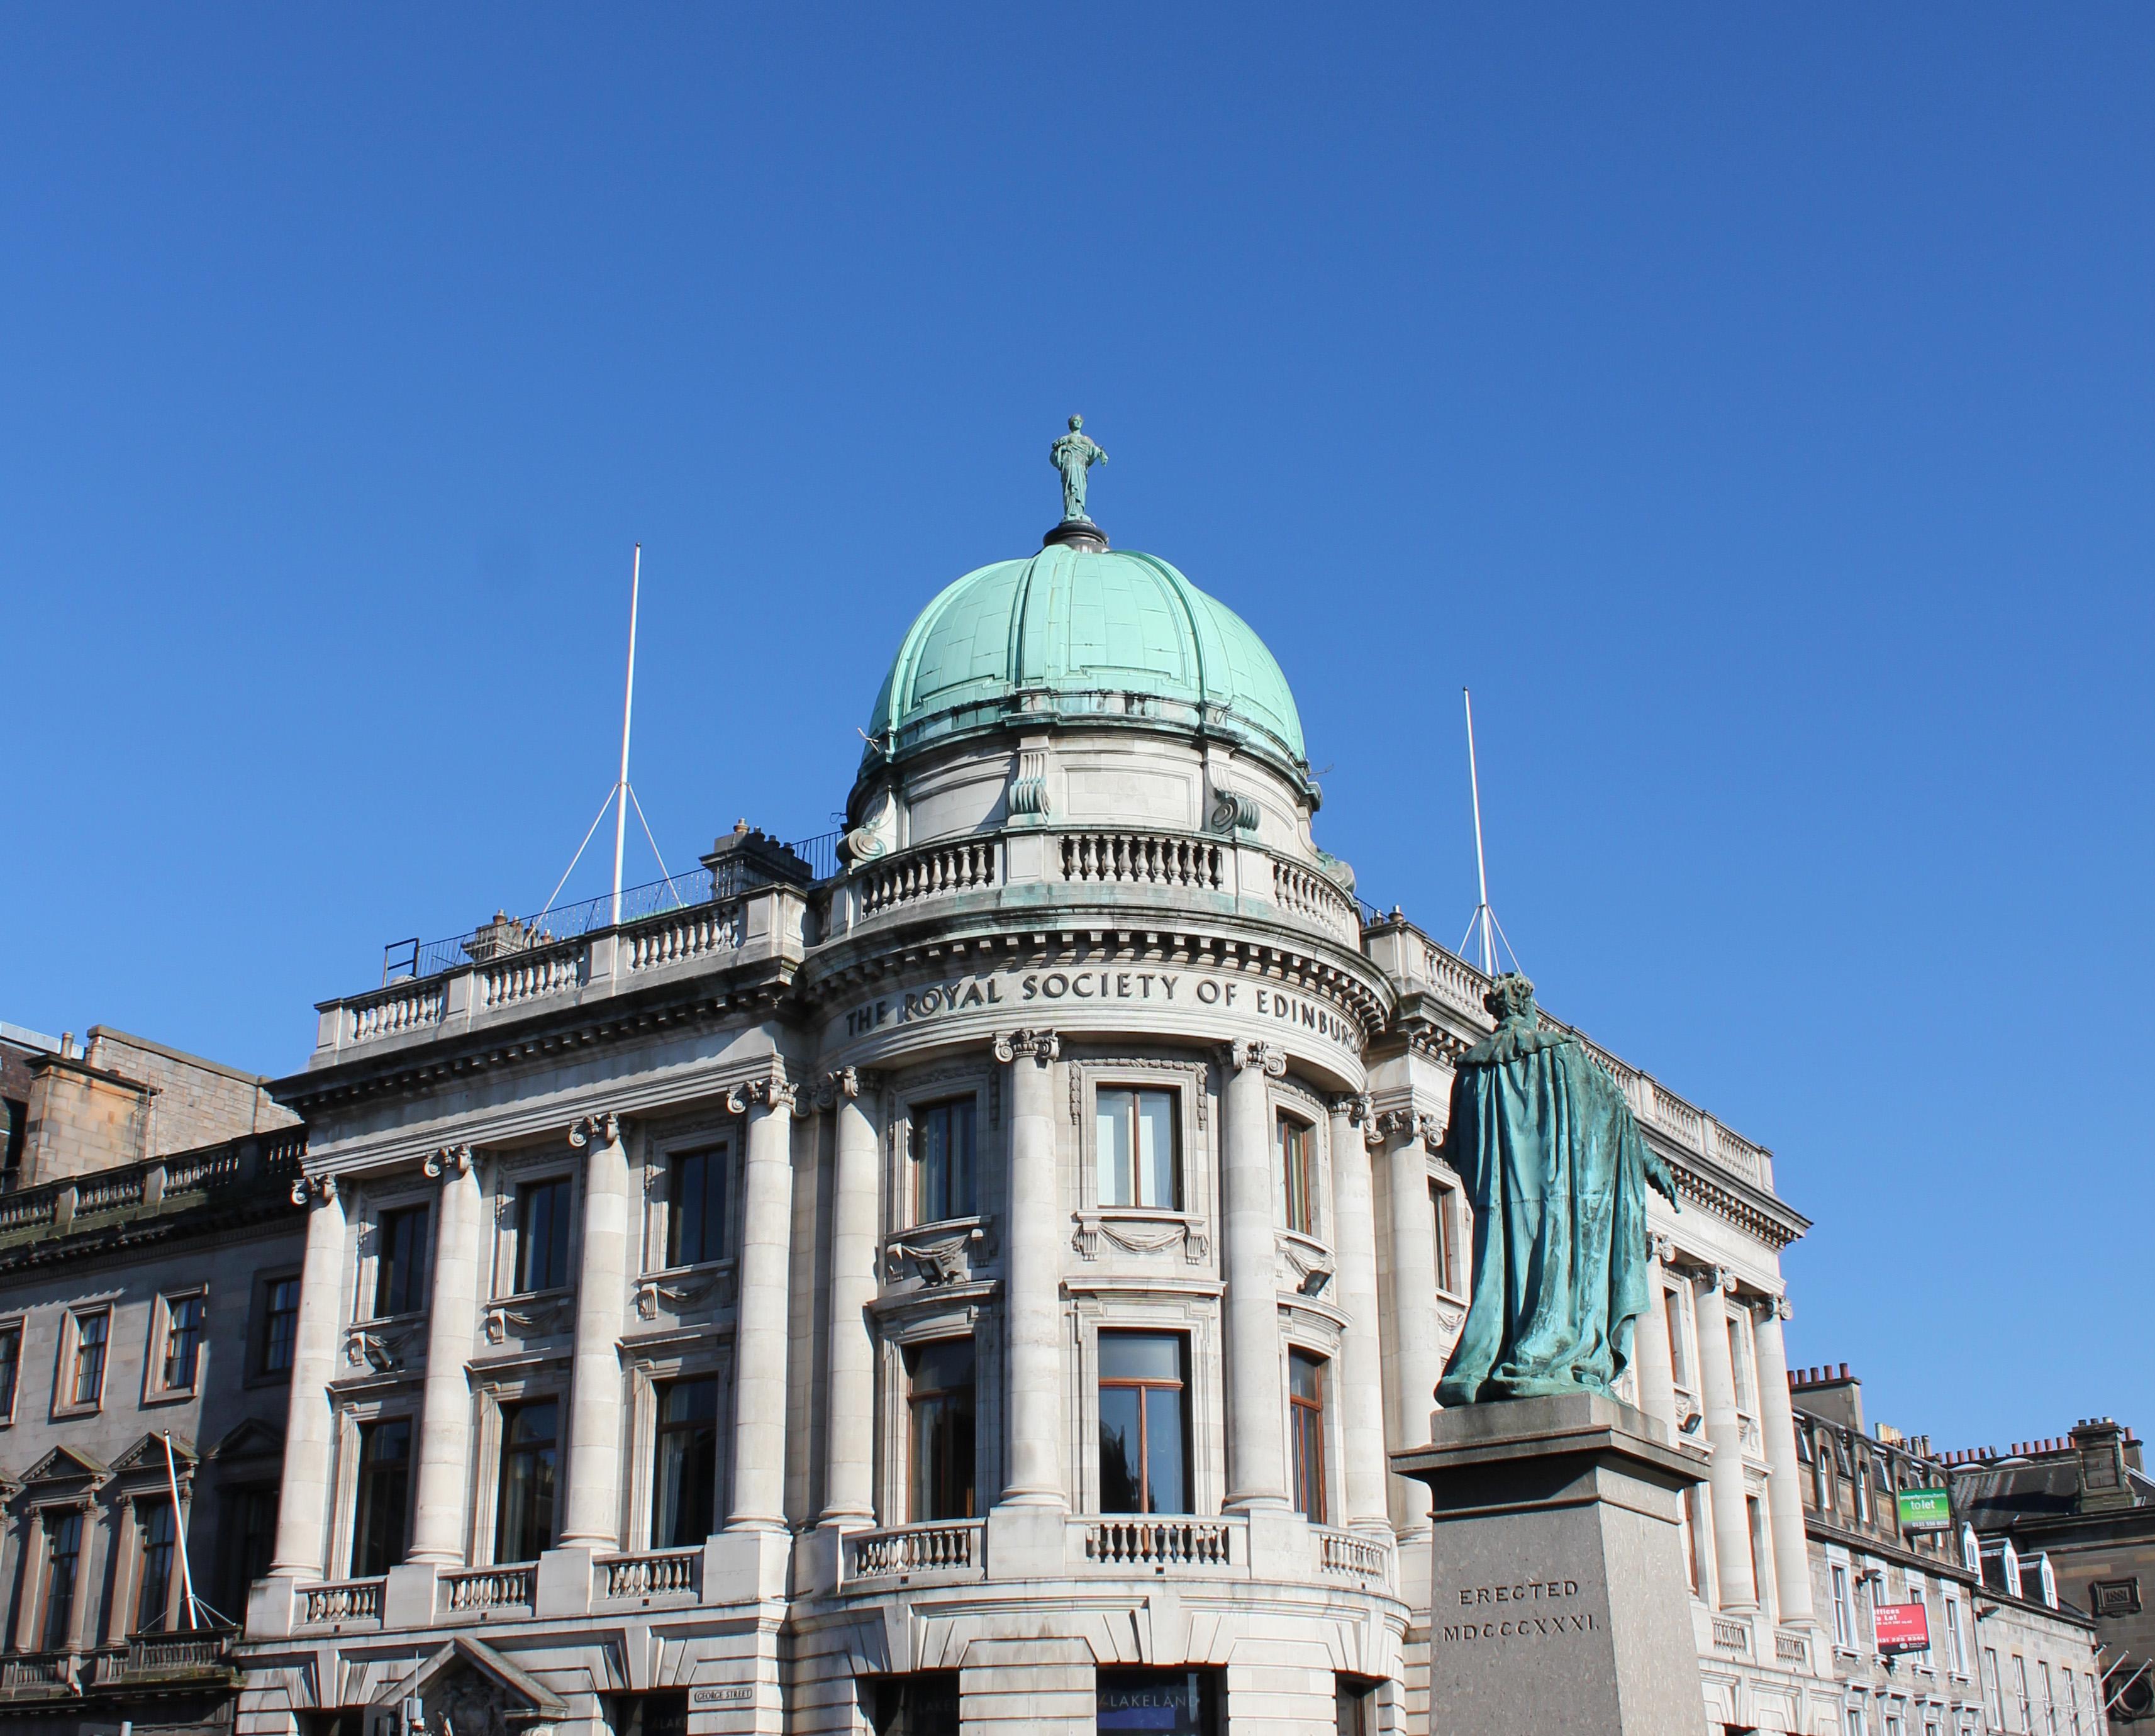 UK_Royal Society of Edinburgh